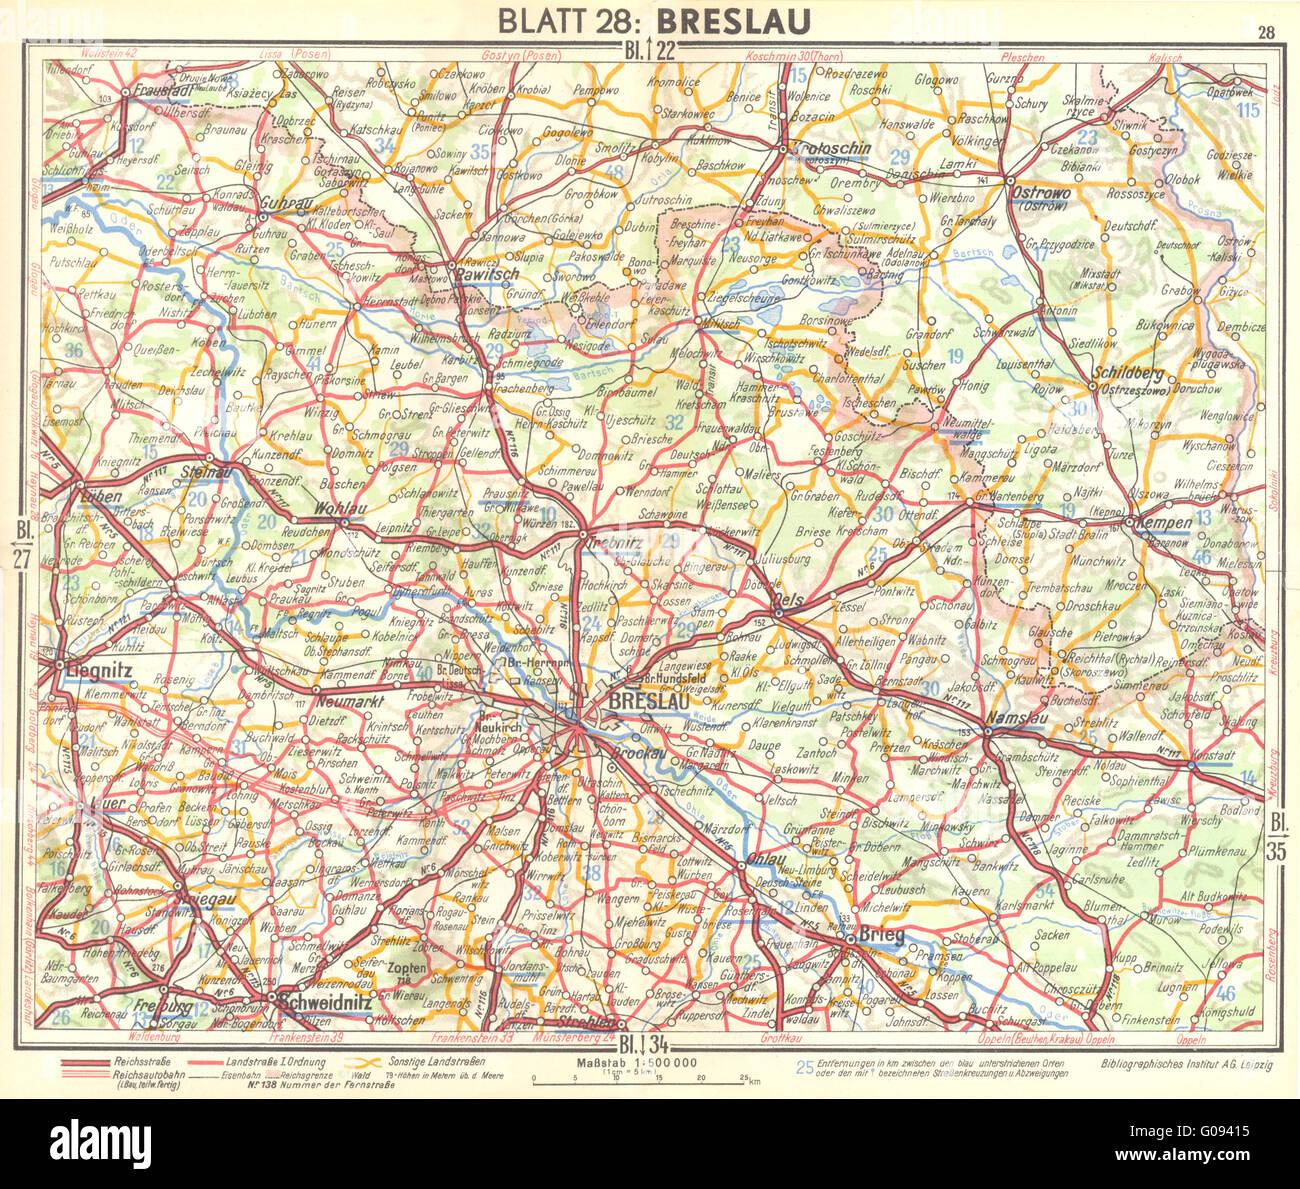 Breslau Map Stock Photos Breslau Map Stock Images Alamy